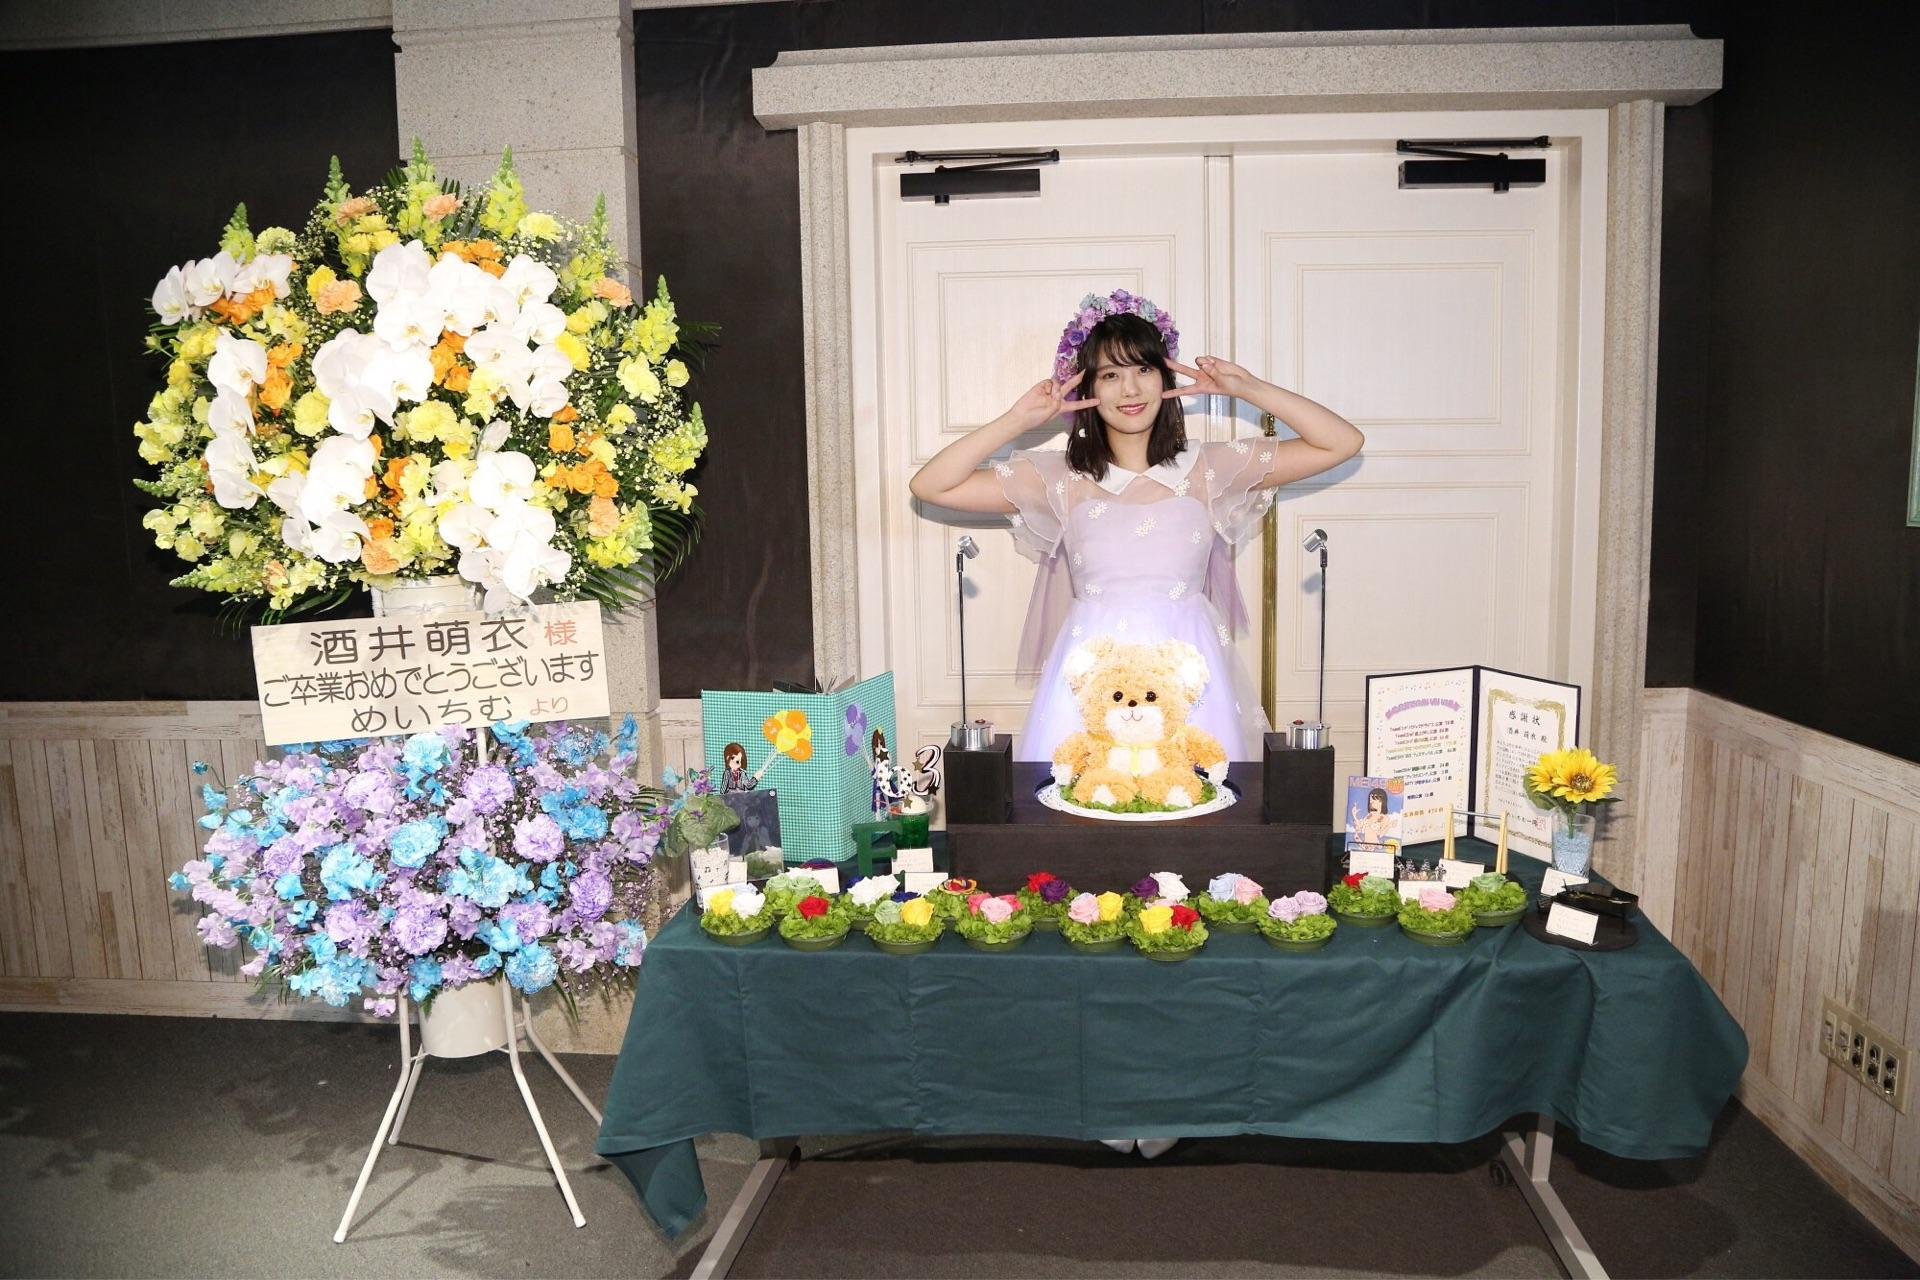 【SKE48 祝卒業】酒井萌衣応援スレ☆10【めいめい】©2ch.netYouTube動画>3本 ->画像>423枚